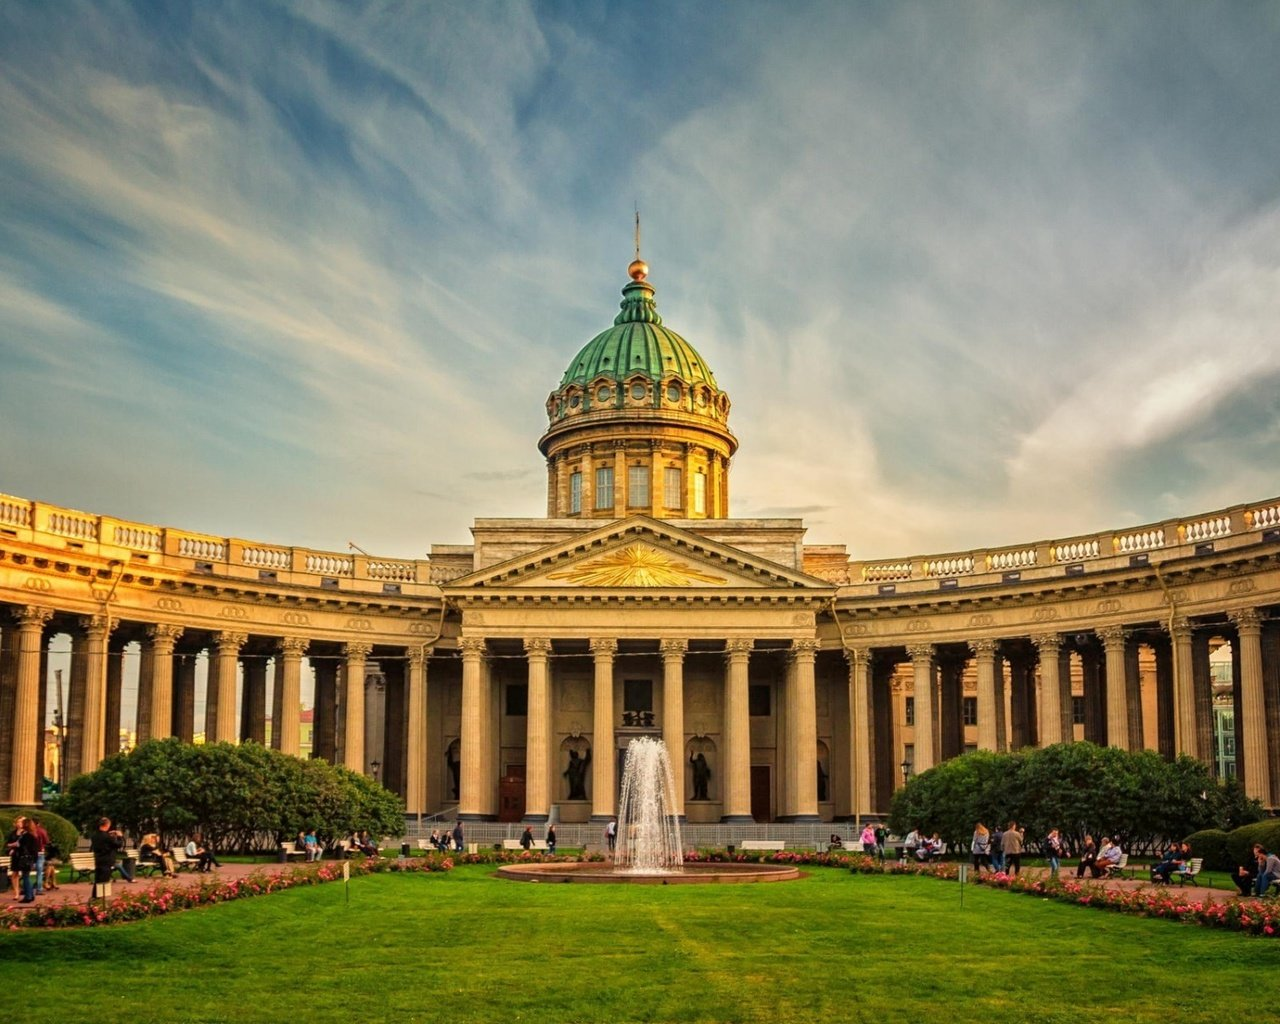 sobor-fontan-sankt-peterburg-kazanskij.jpg